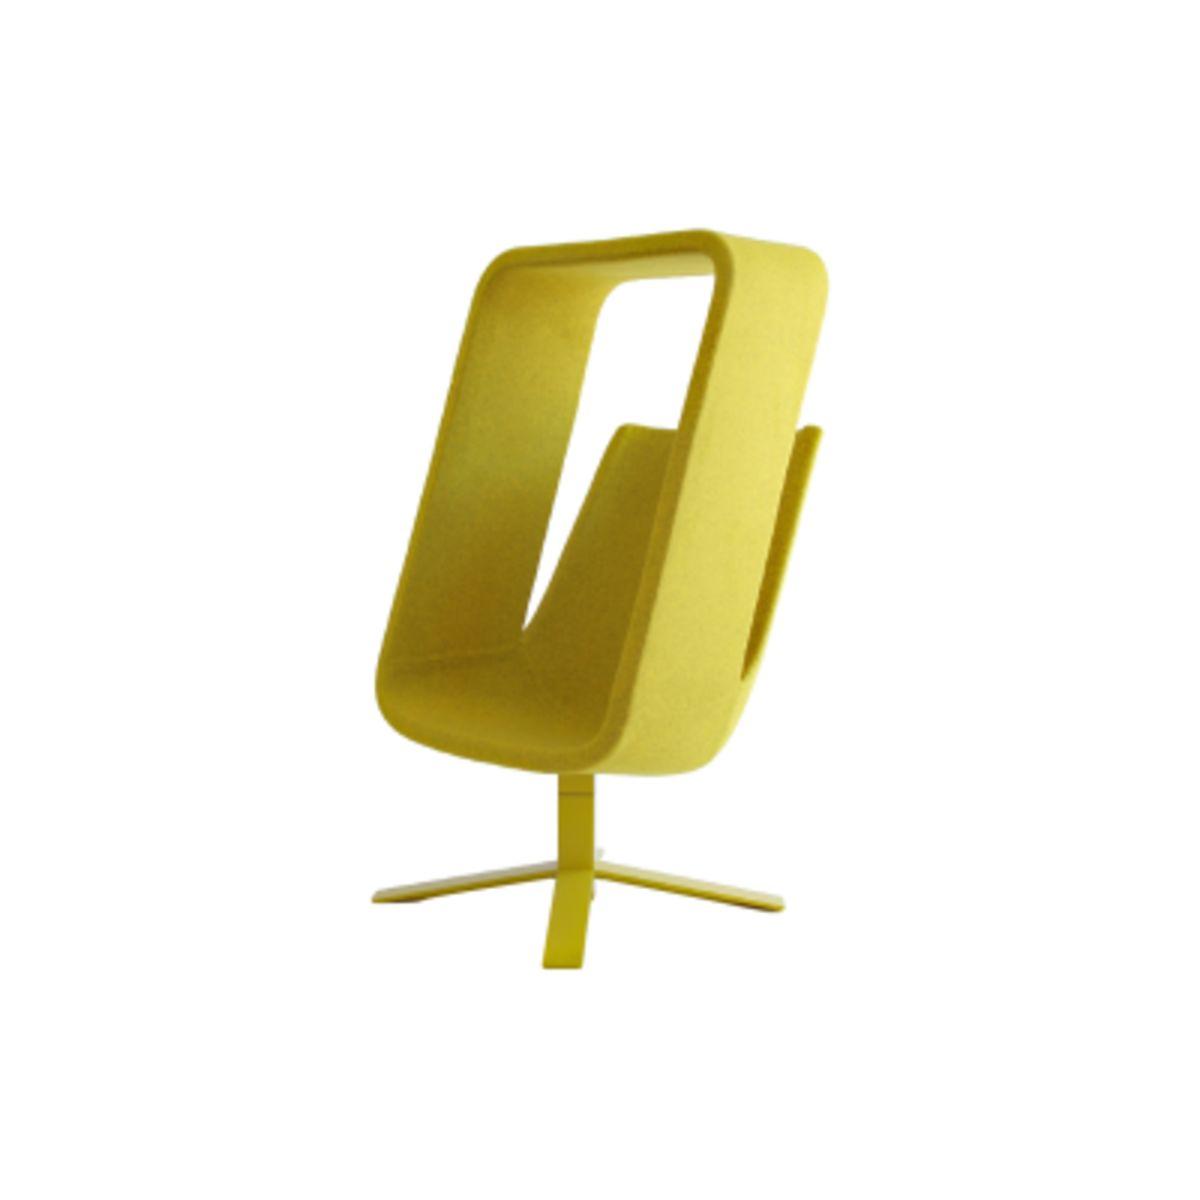 Surprising Windowseat Lounge Chair By Haworth Ibusinesslaw Wood Chair Design Ideas Ibusinesslaworg